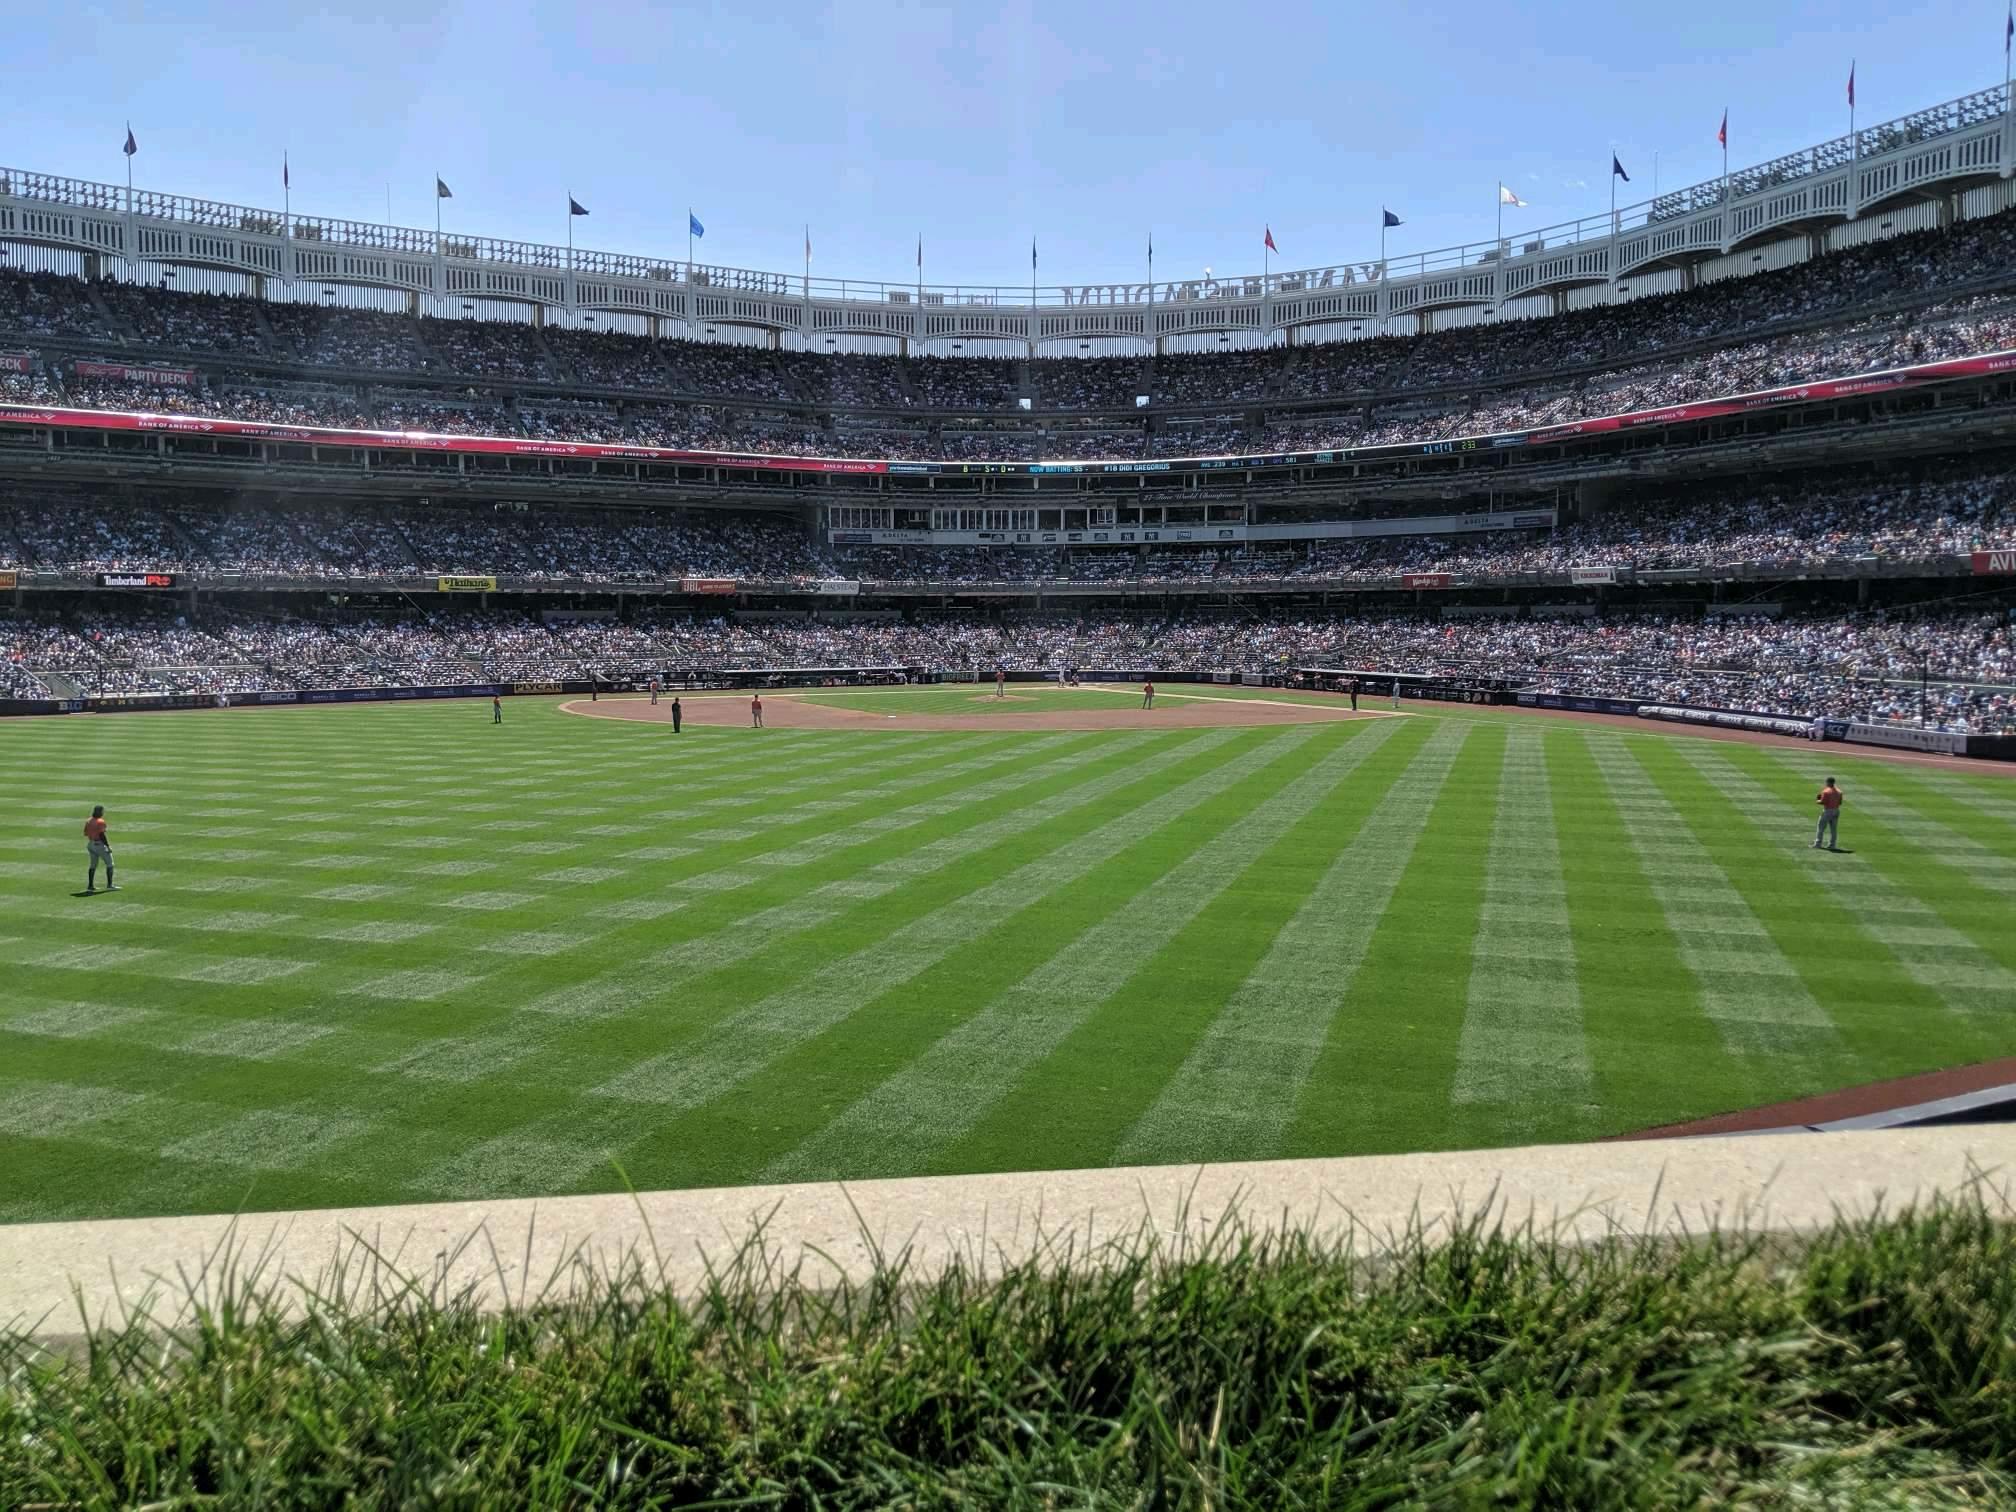 Yankee Stadium Secção 238 Fila 1 Lugar 4